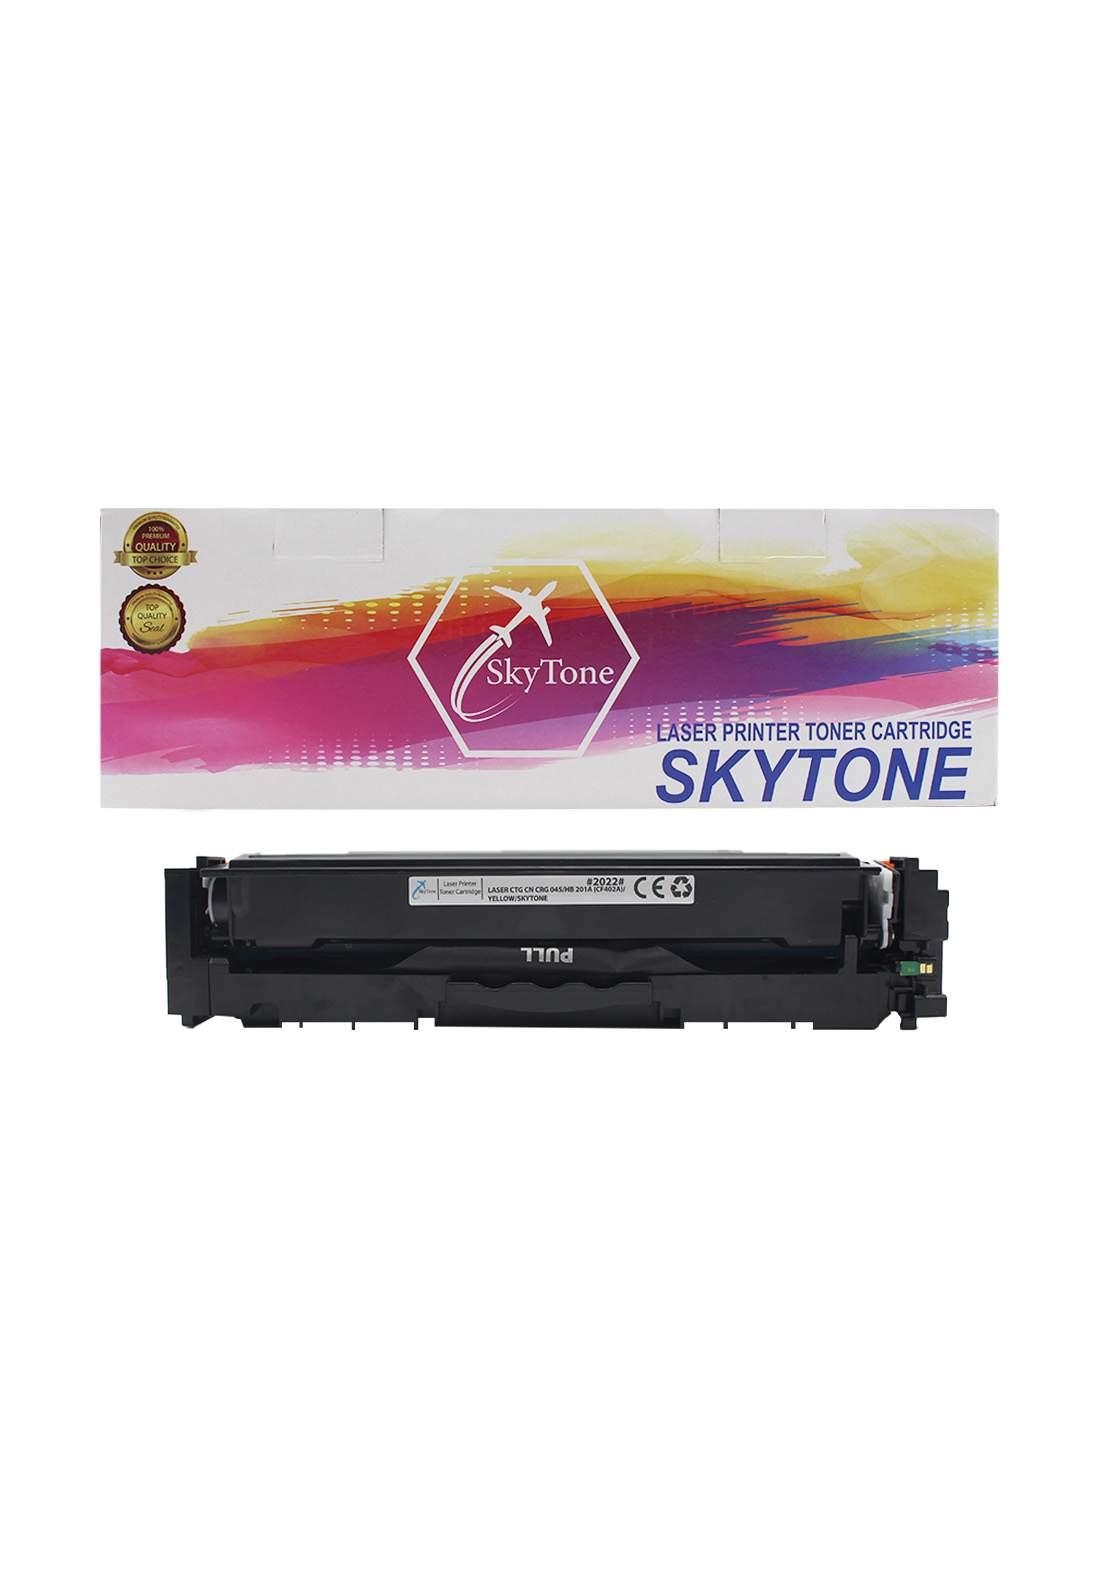 SKYTONE CTG Canon CRG 045/HP 201A (CF402A) Laser Printer Toner Cartridge خرطوشة حبر